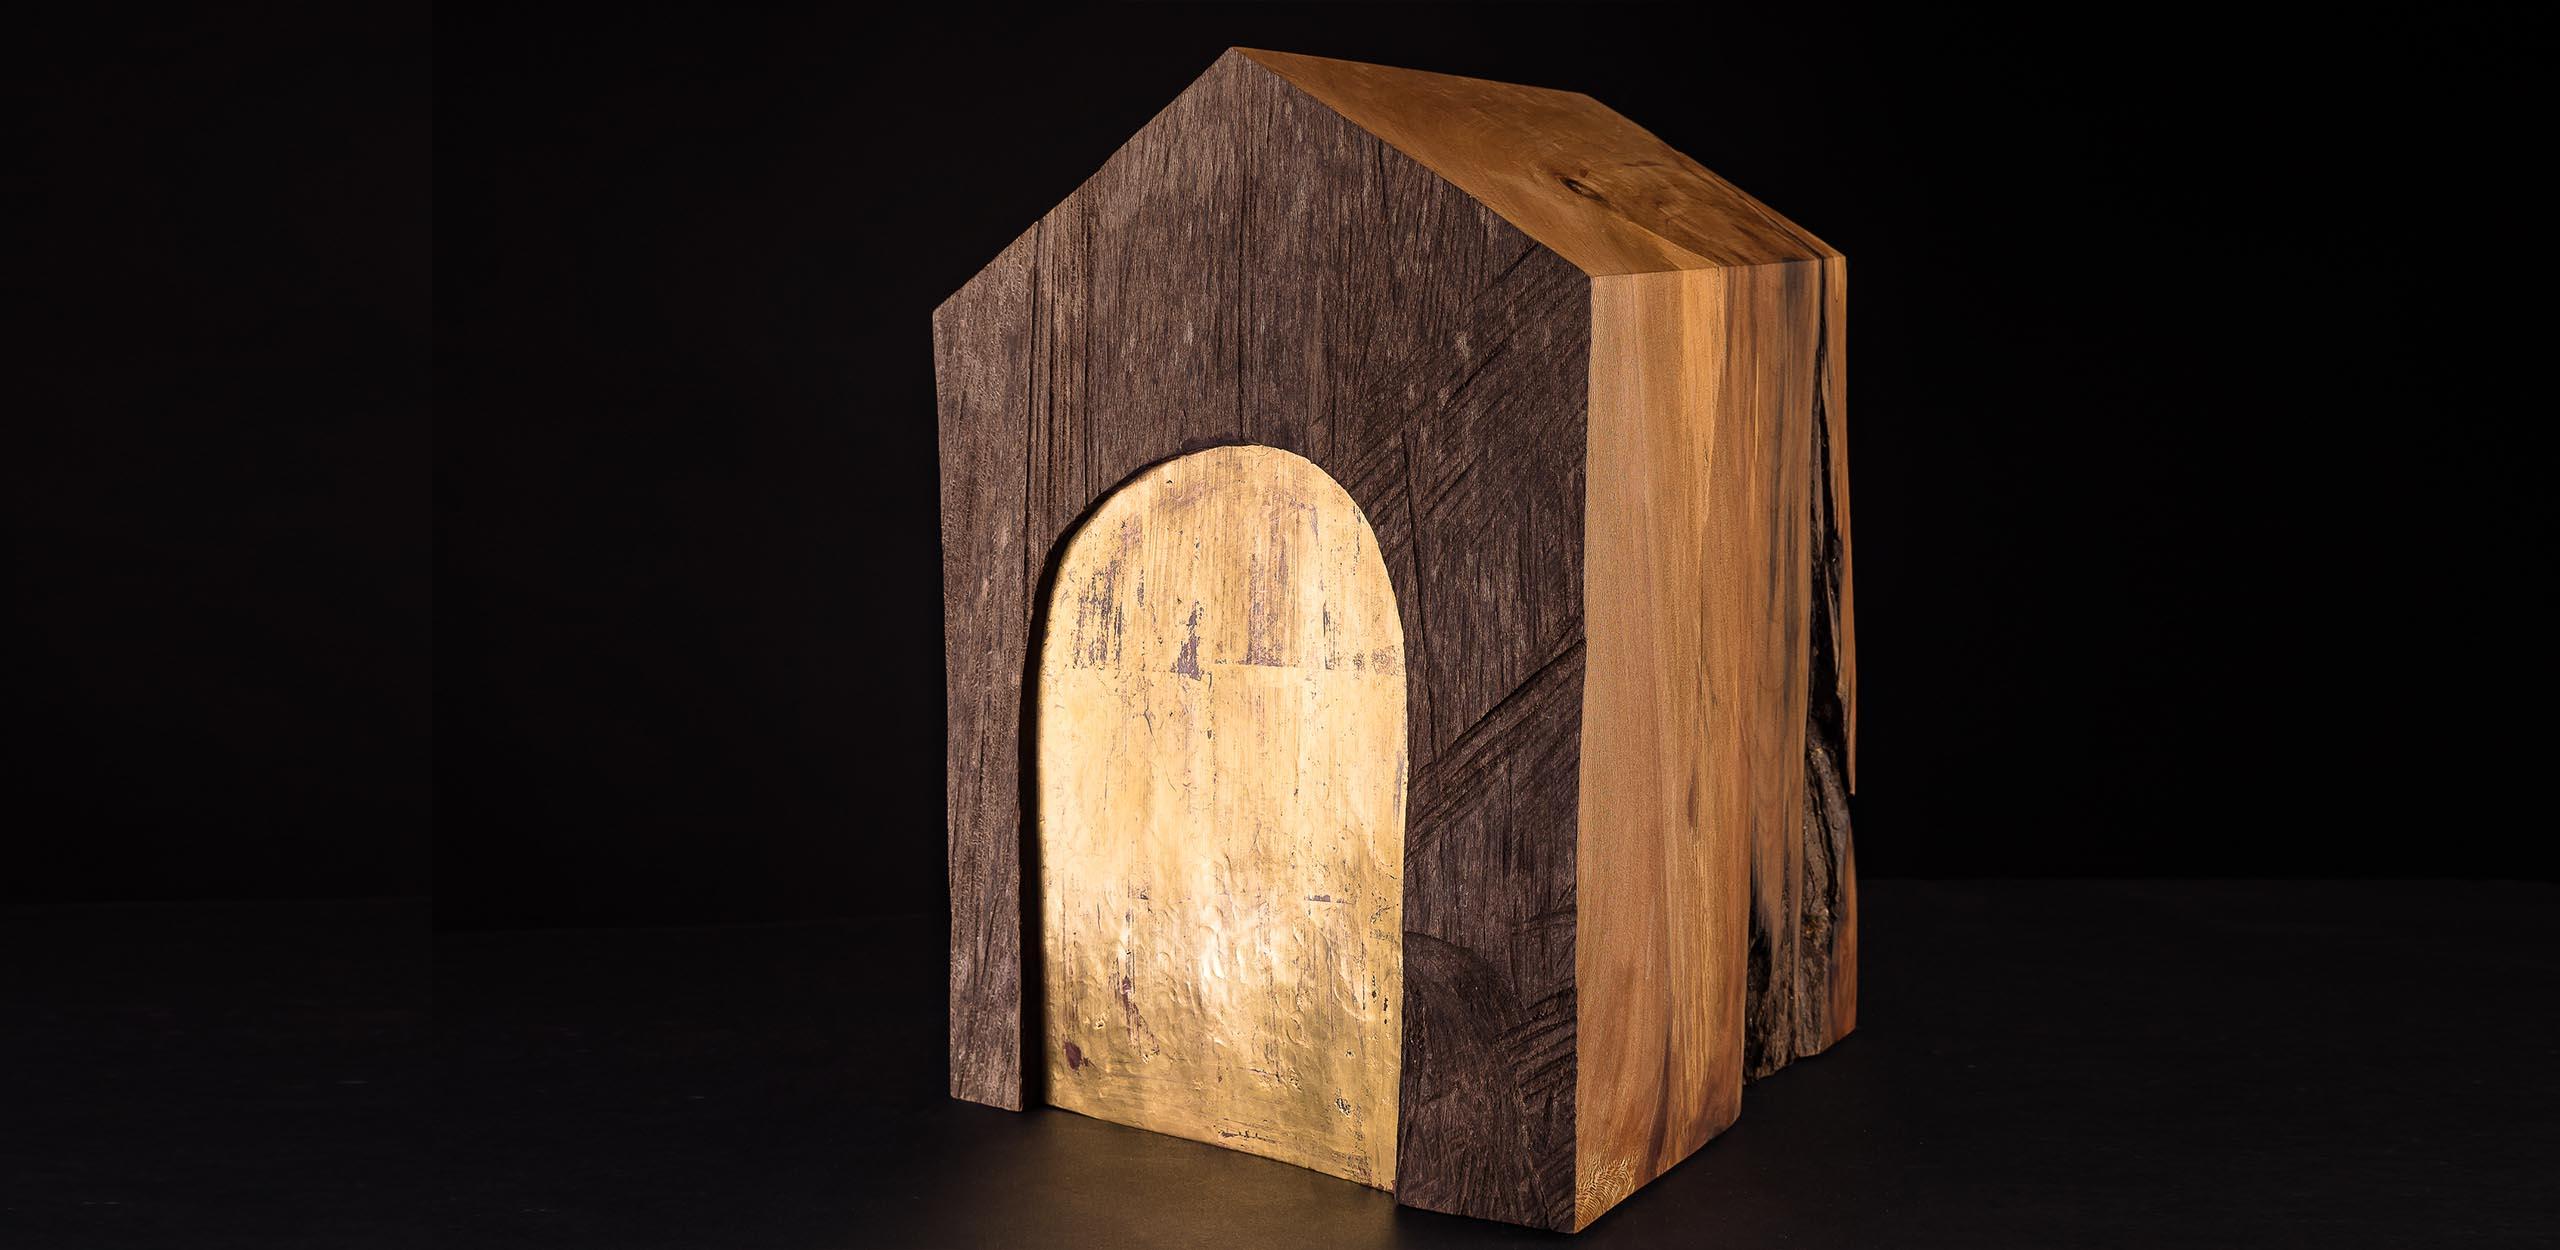 Urne aus Platanenholz